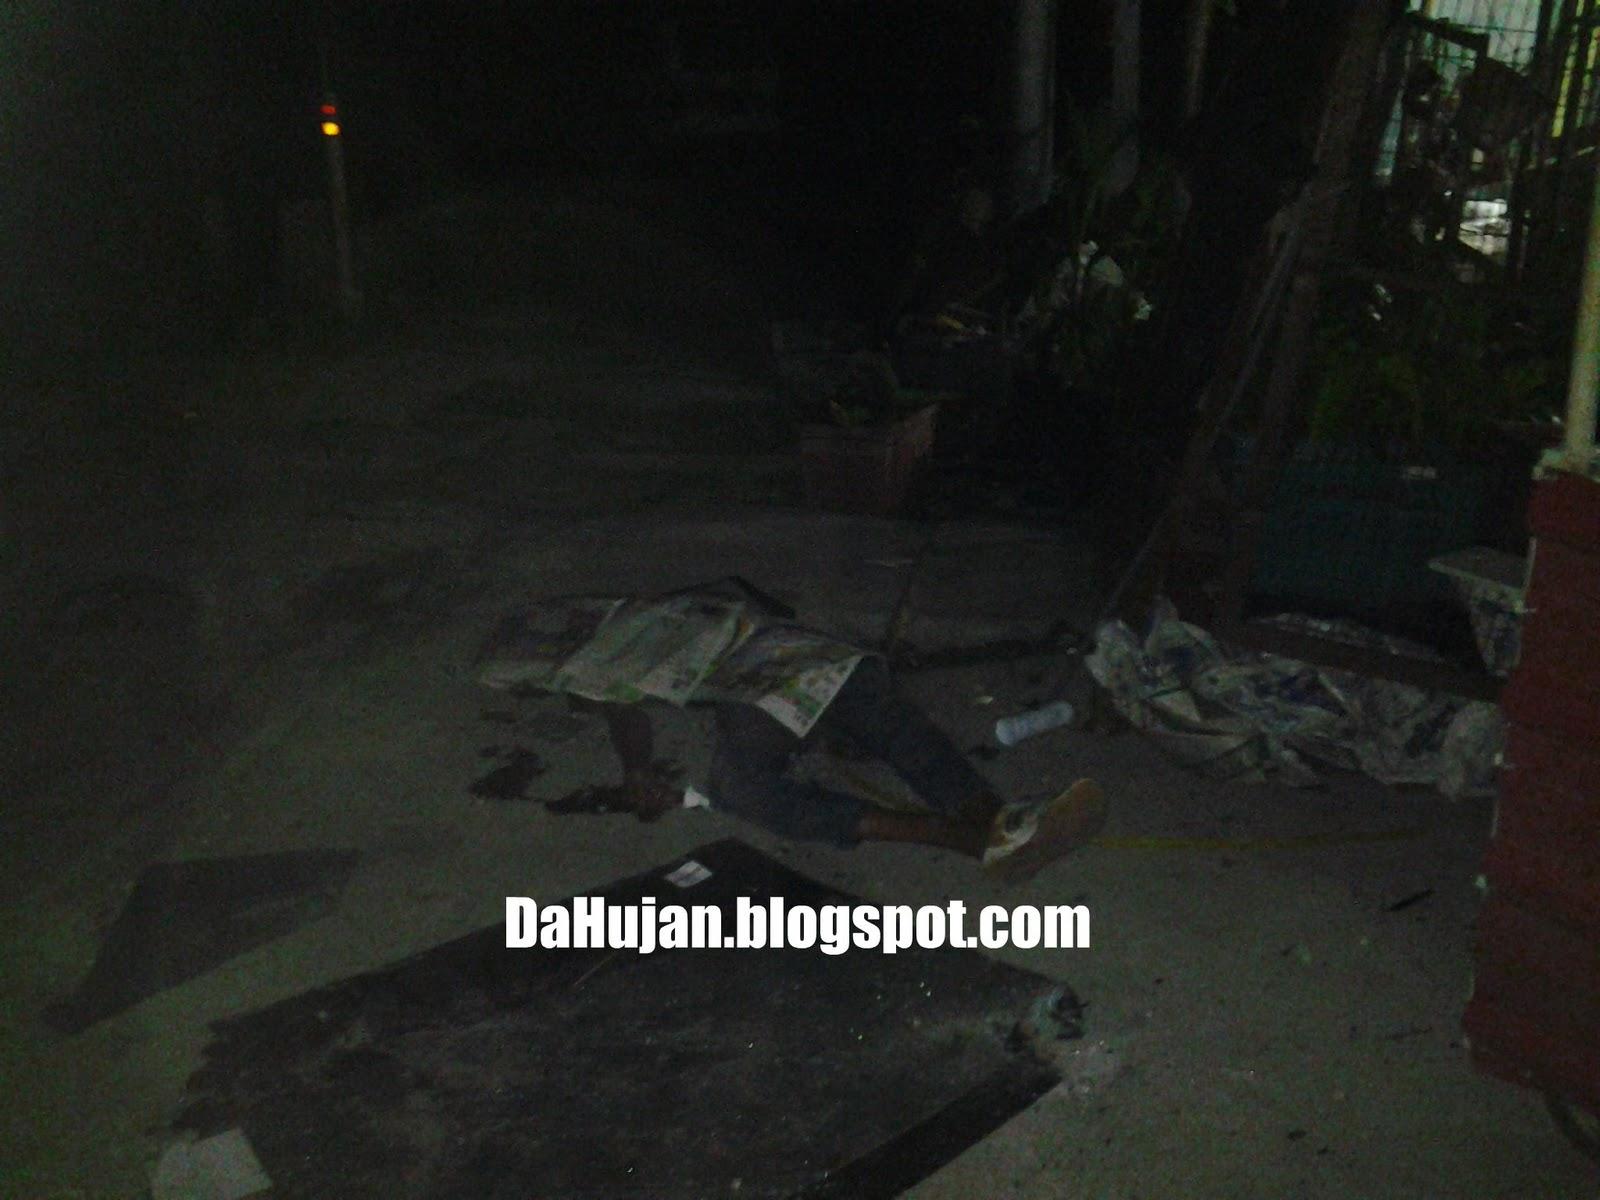 http://2.bp.blogspot.com/-Dq9mi8huW6U/Tv--0LKMUkI/AAAAAAAAAa0/1kNHFdISKN4/s1600/20111231_235241.jpg